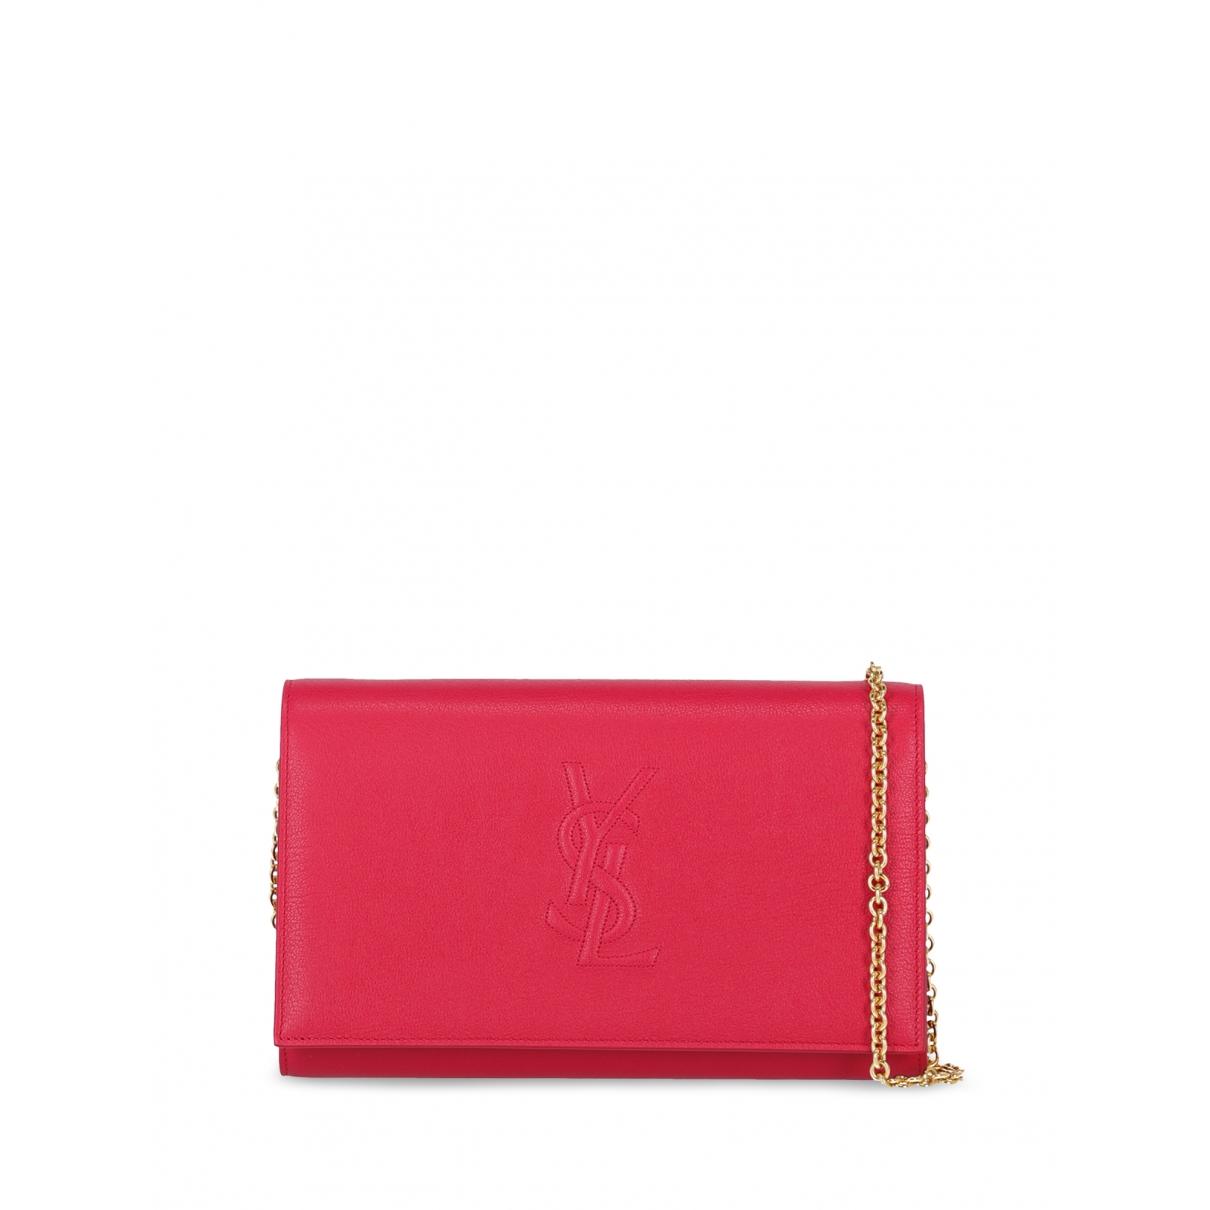 Saint Laurent \N Pink Leather Clutch bag for Women \N